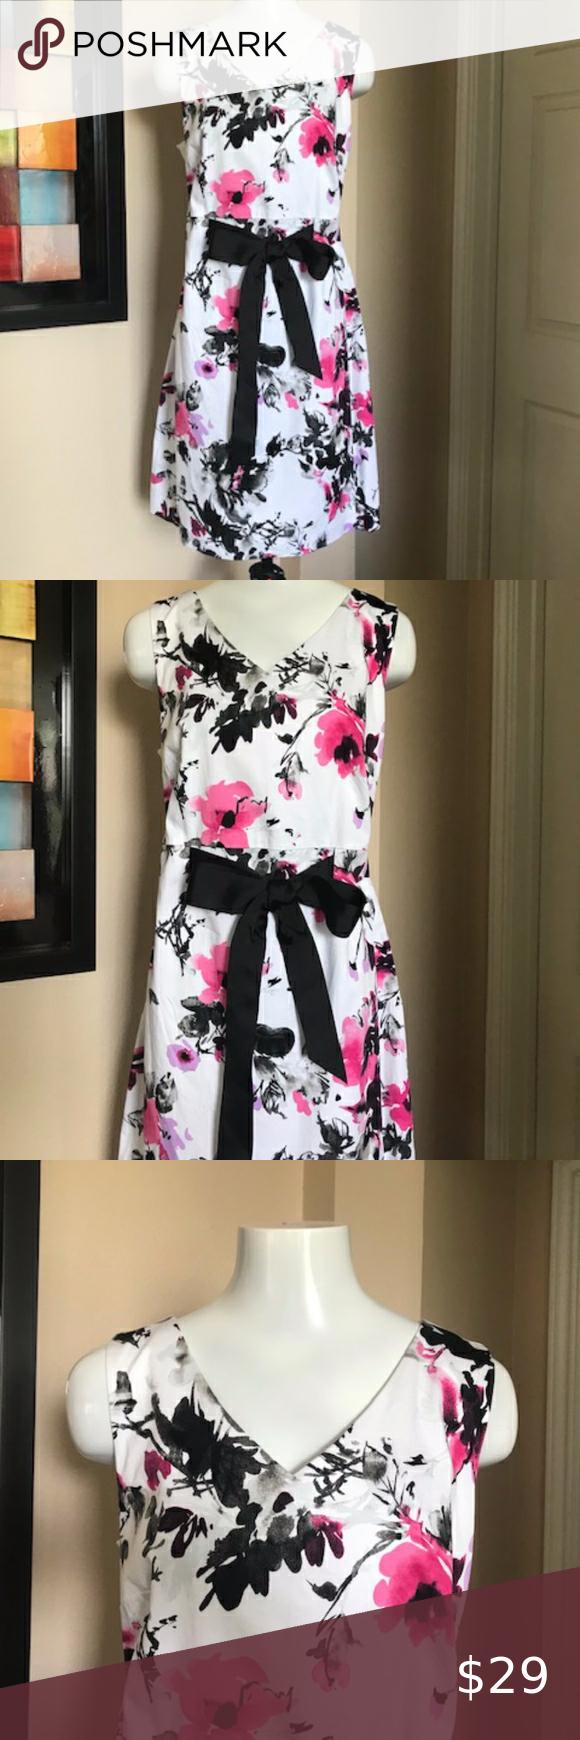 Lane Bryant Summer Dress Size 18 Size 18 Dress Summer Dresses Lane Bryant Dresses [ 1740 x 580 Pixel ]